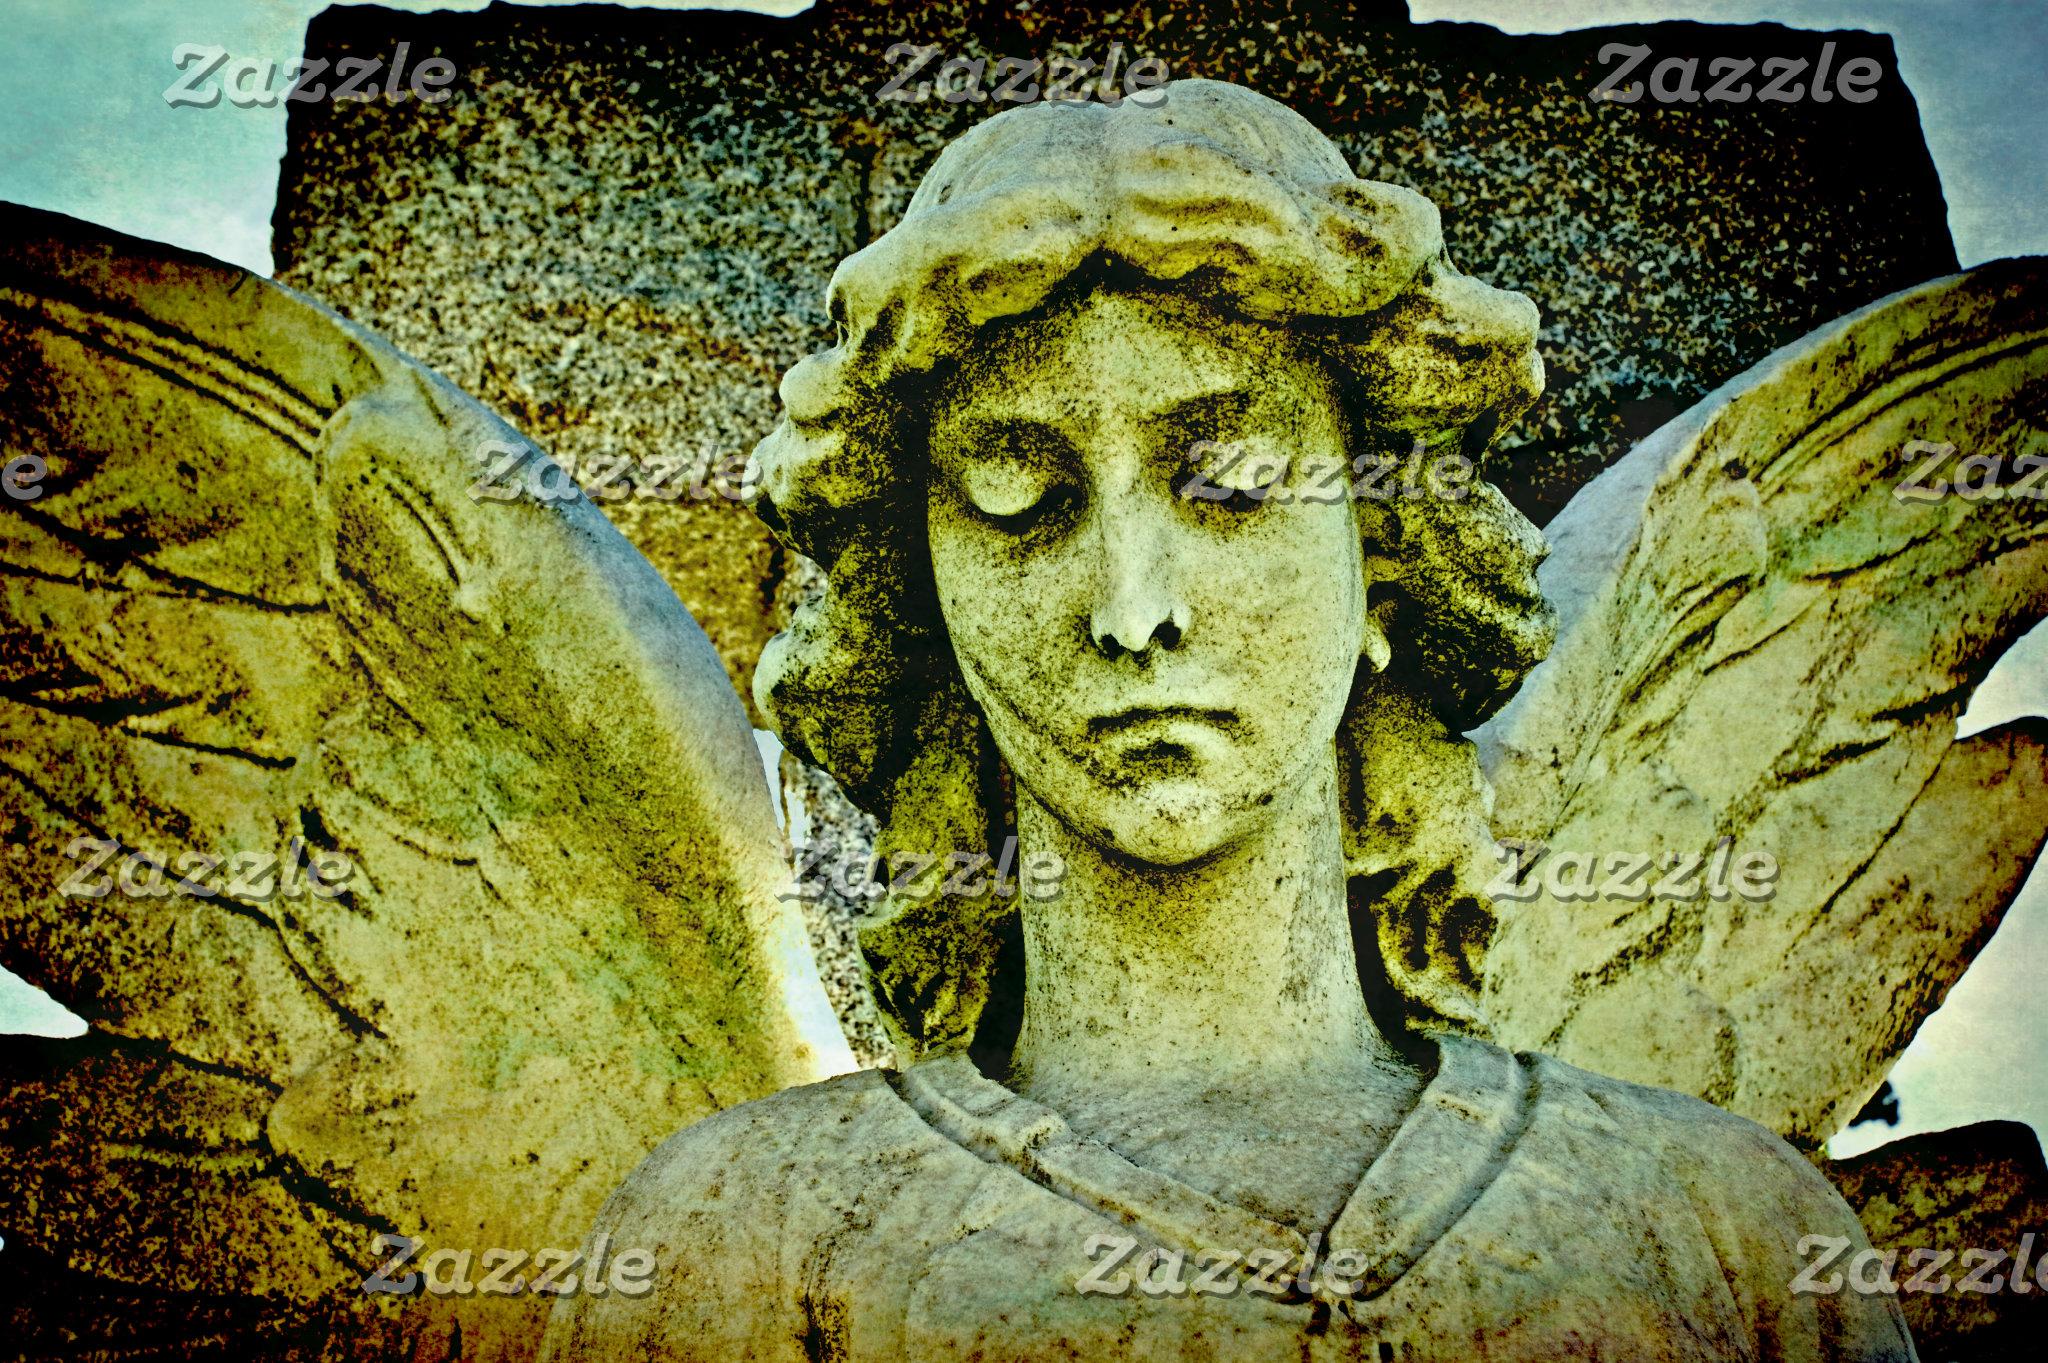 Cemetery Art/Statues